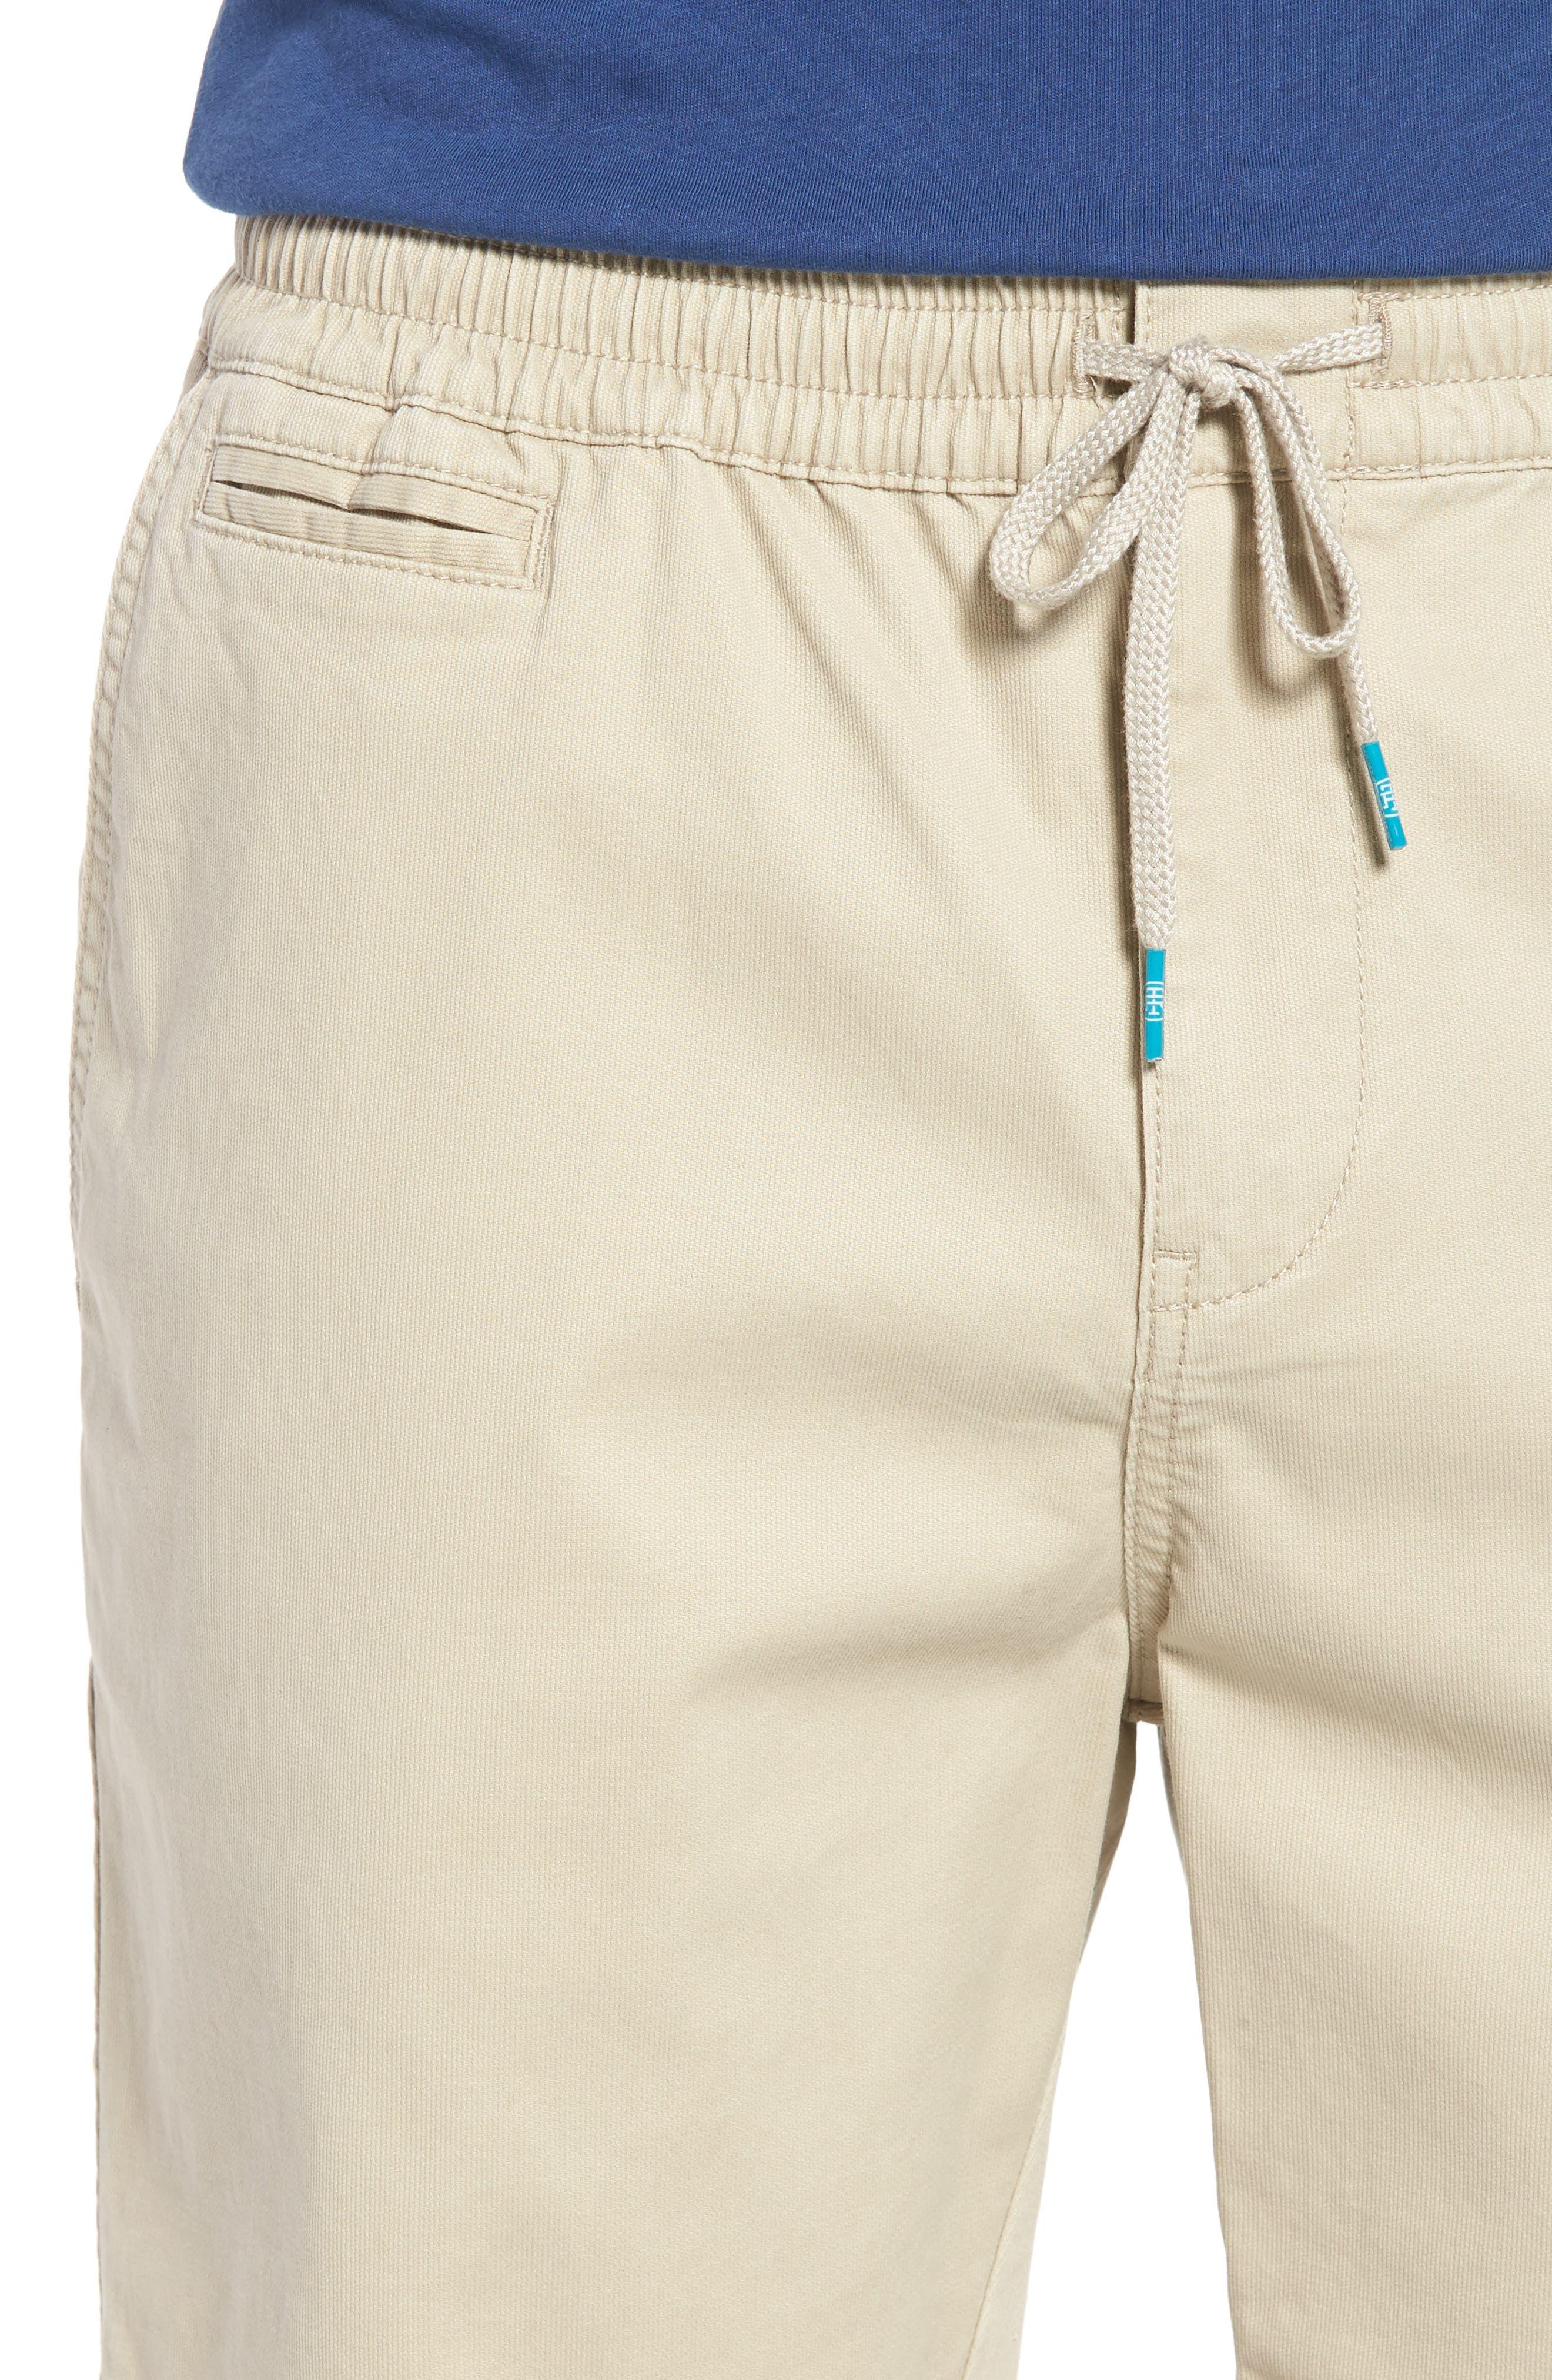 Drawstring Bedford Corduroy Shorts,                             Alternate thumbnail 11, color,